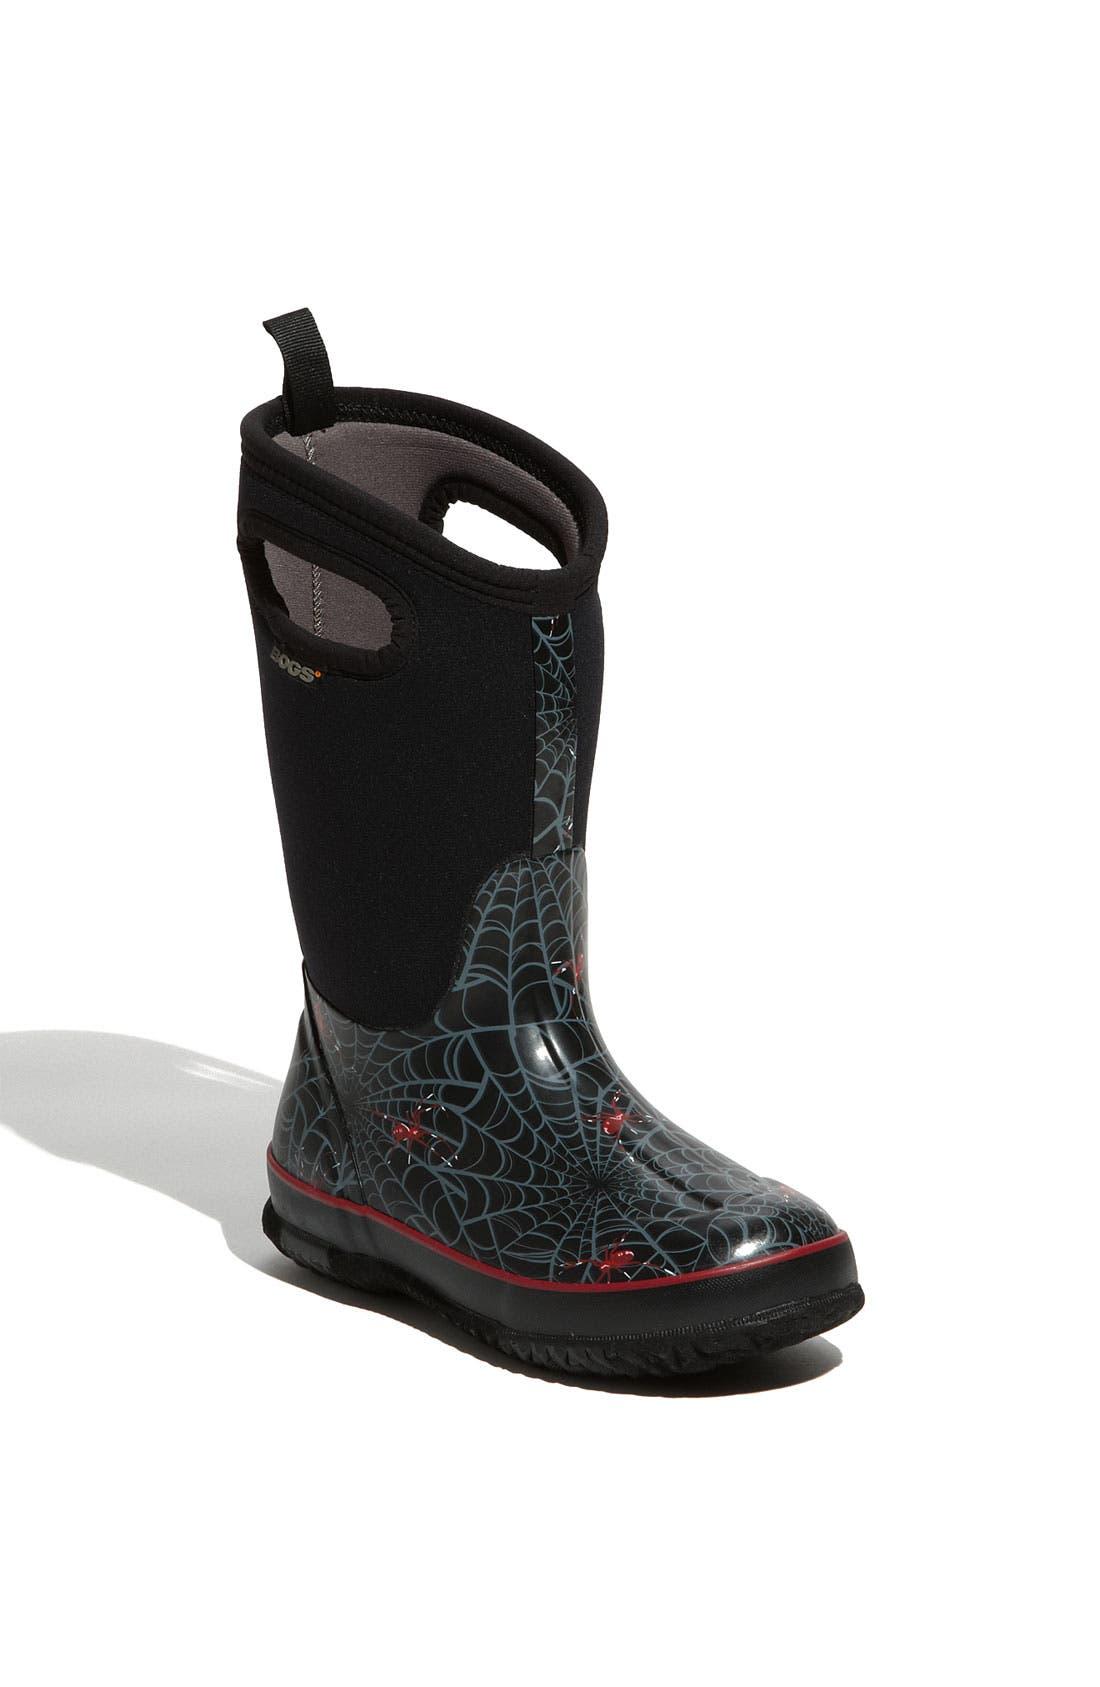 Main Image - Bogs 'Classic High' Waterproof Boot (Walker, Toddler, Little Kid & Big Kid)